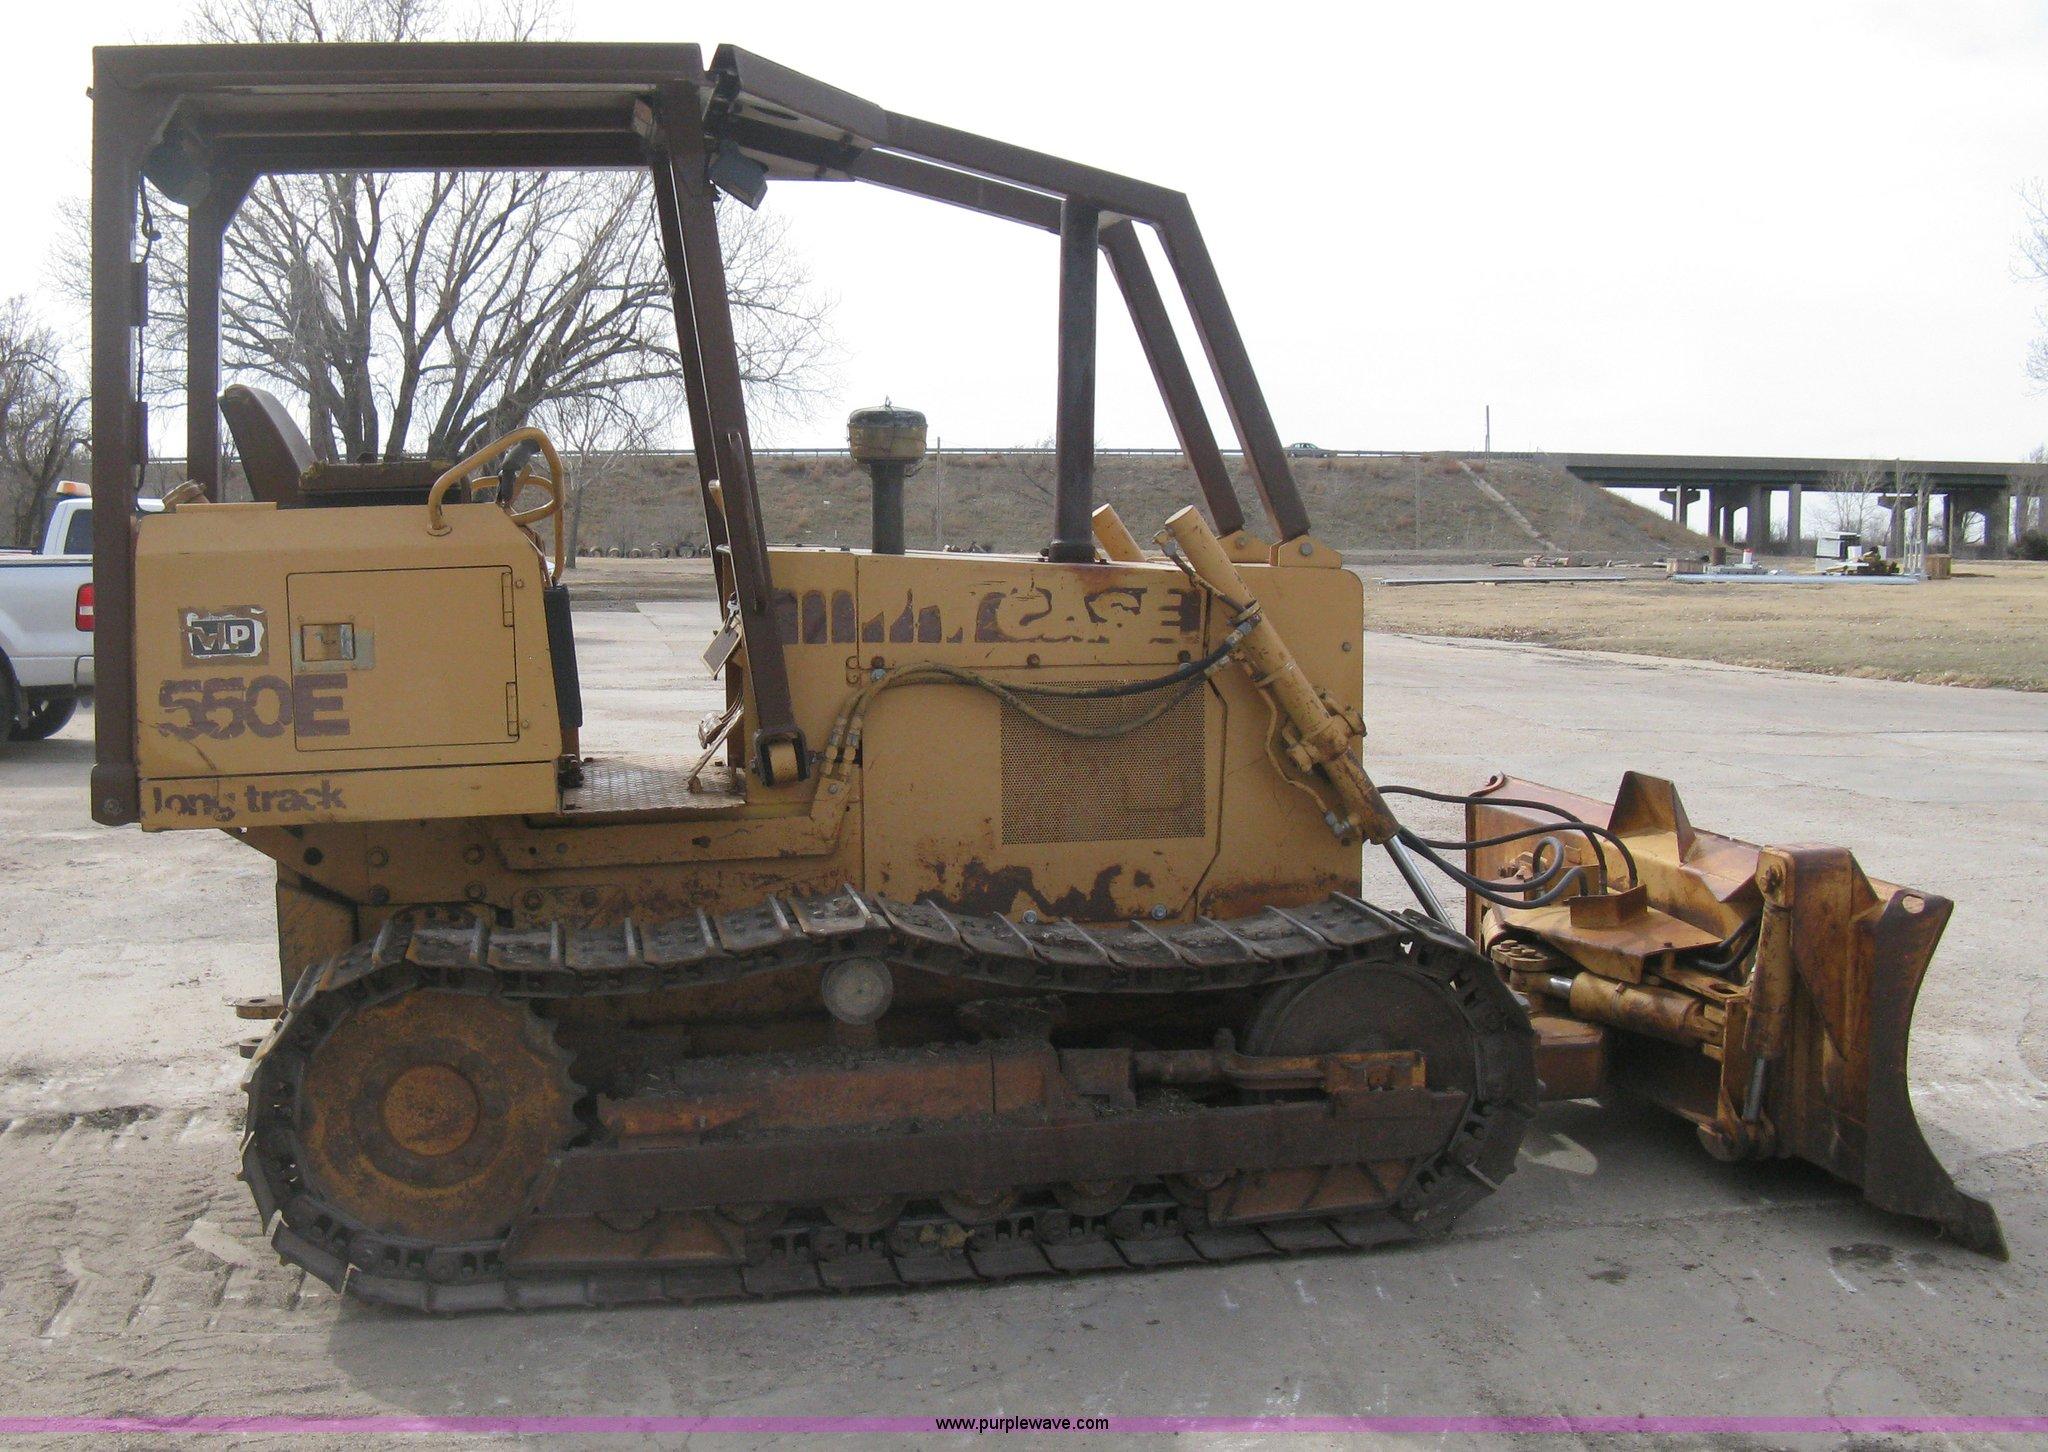 1993 Case 550E long track dozer | Item I5582 | SOLD! April 1